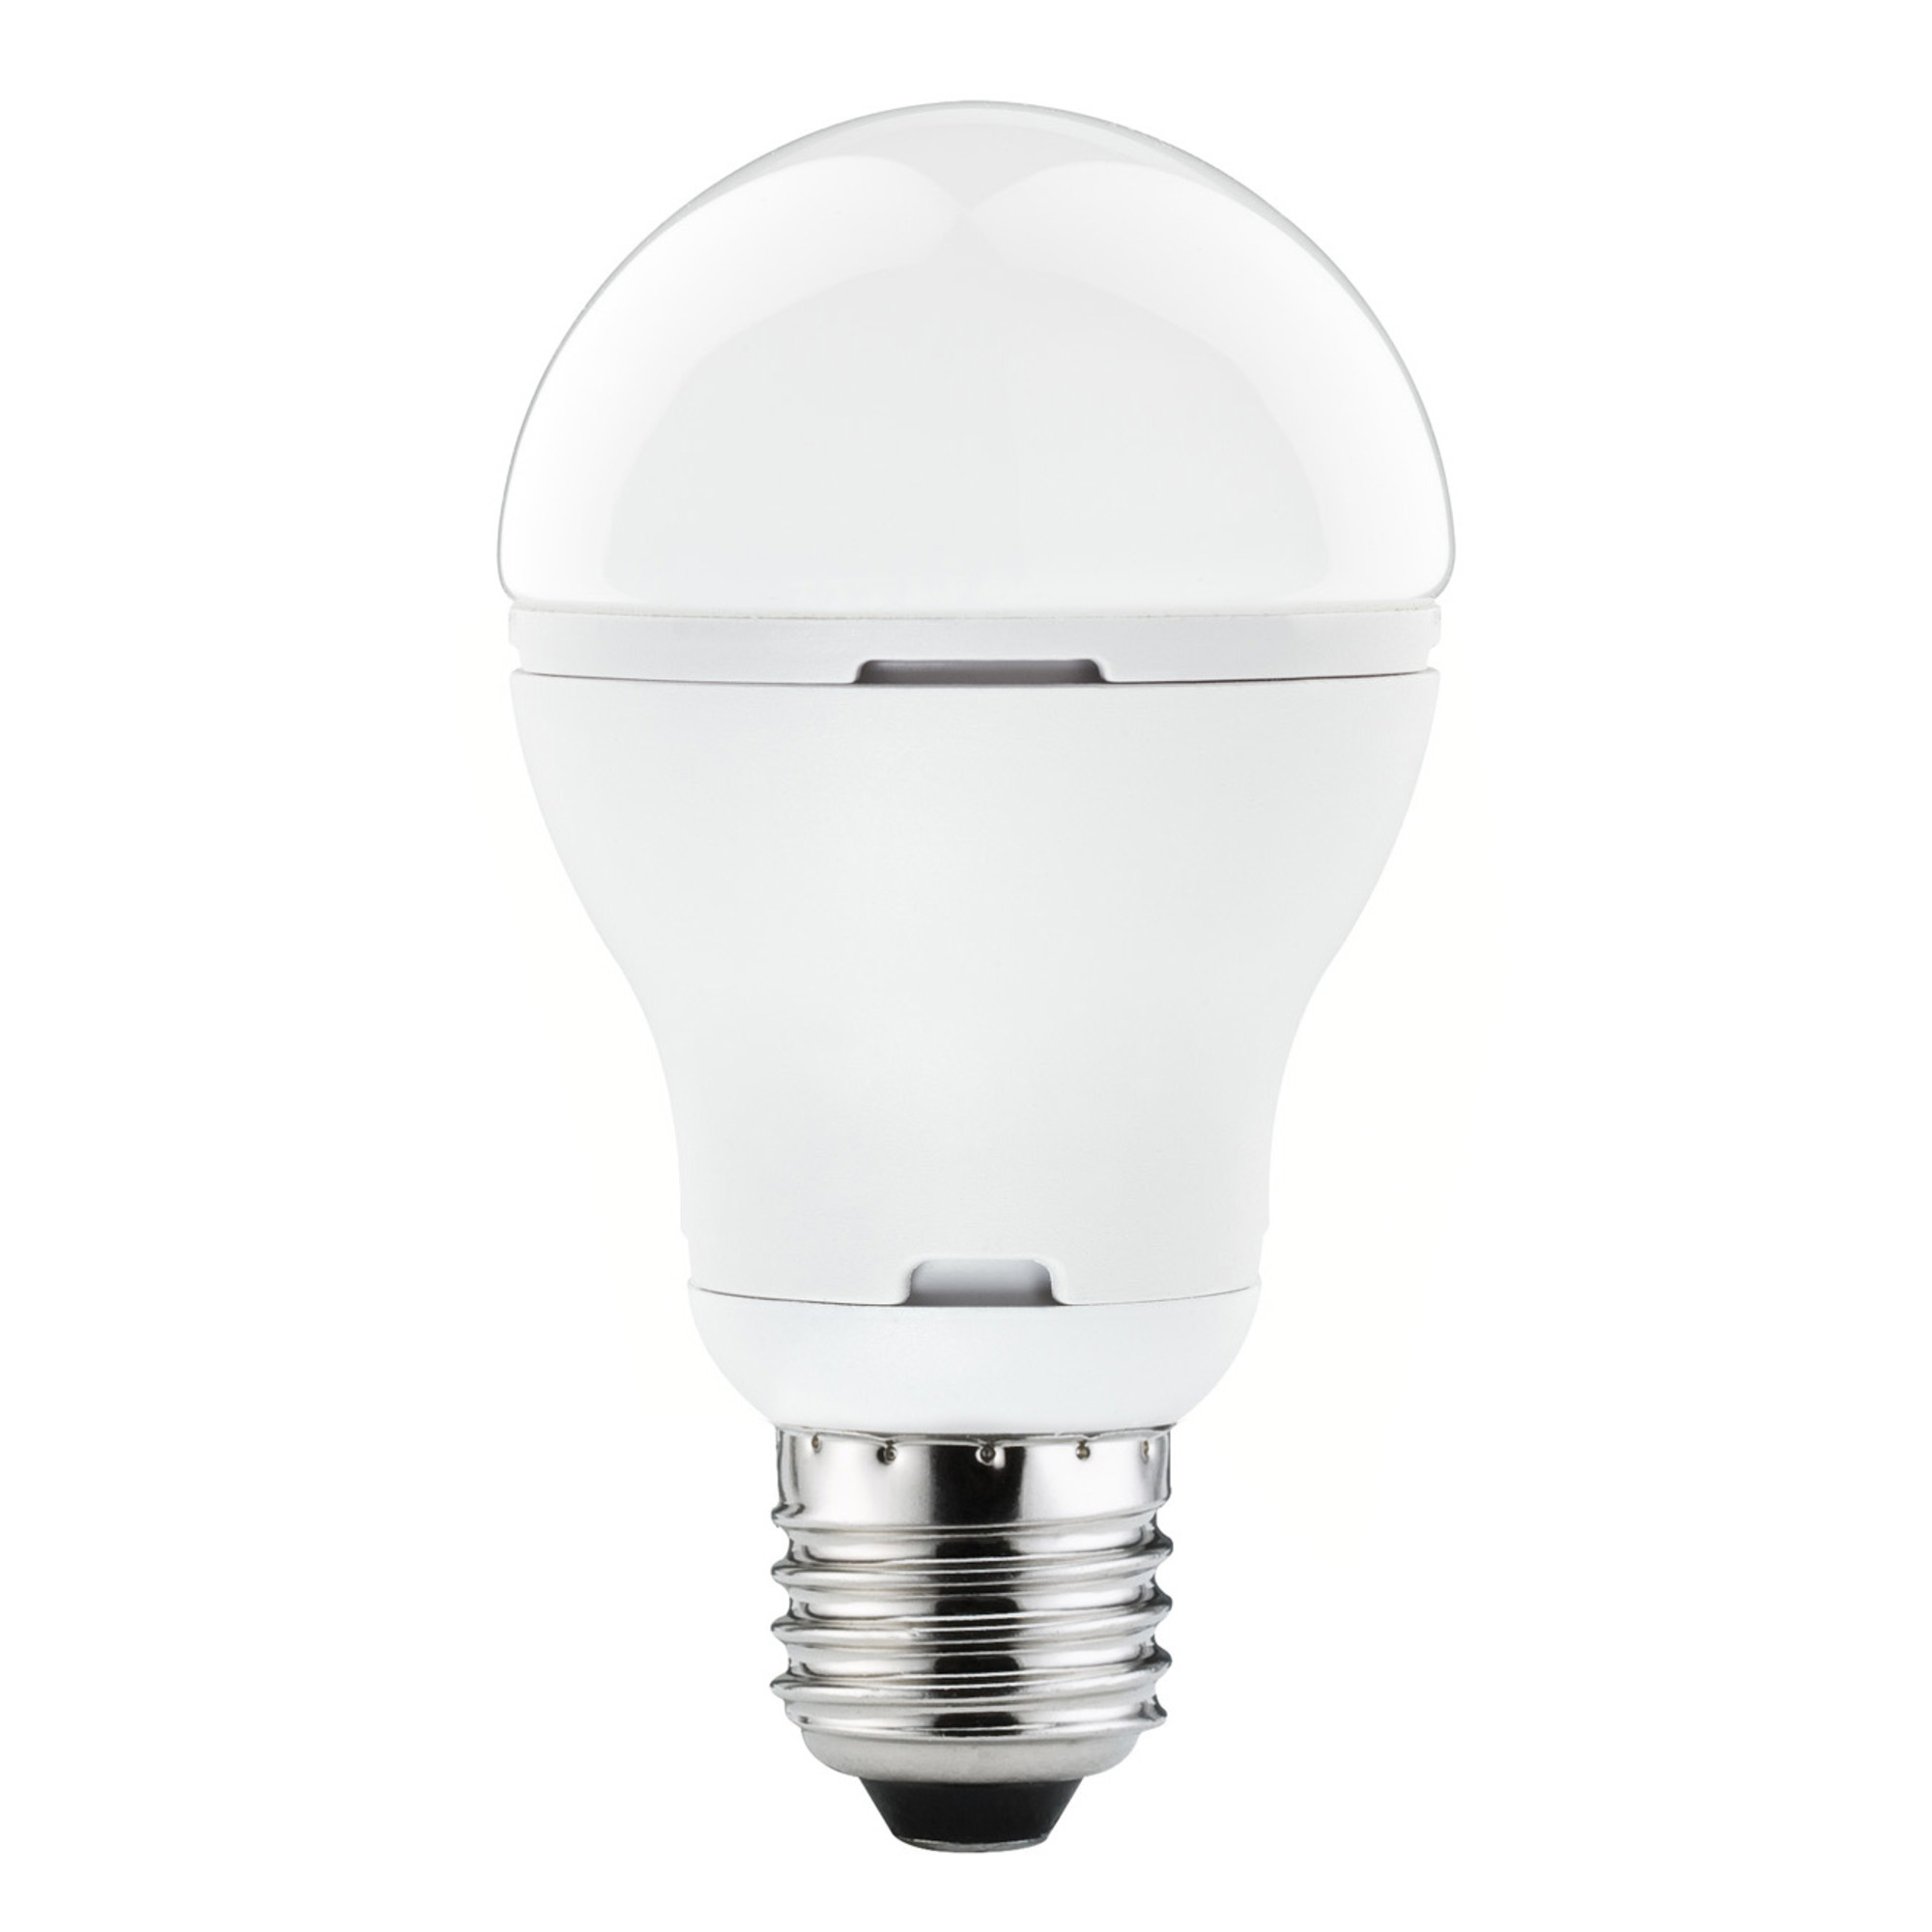 Лампа светодиодная Paulmann 28180 E27 230 Лм теплый свет